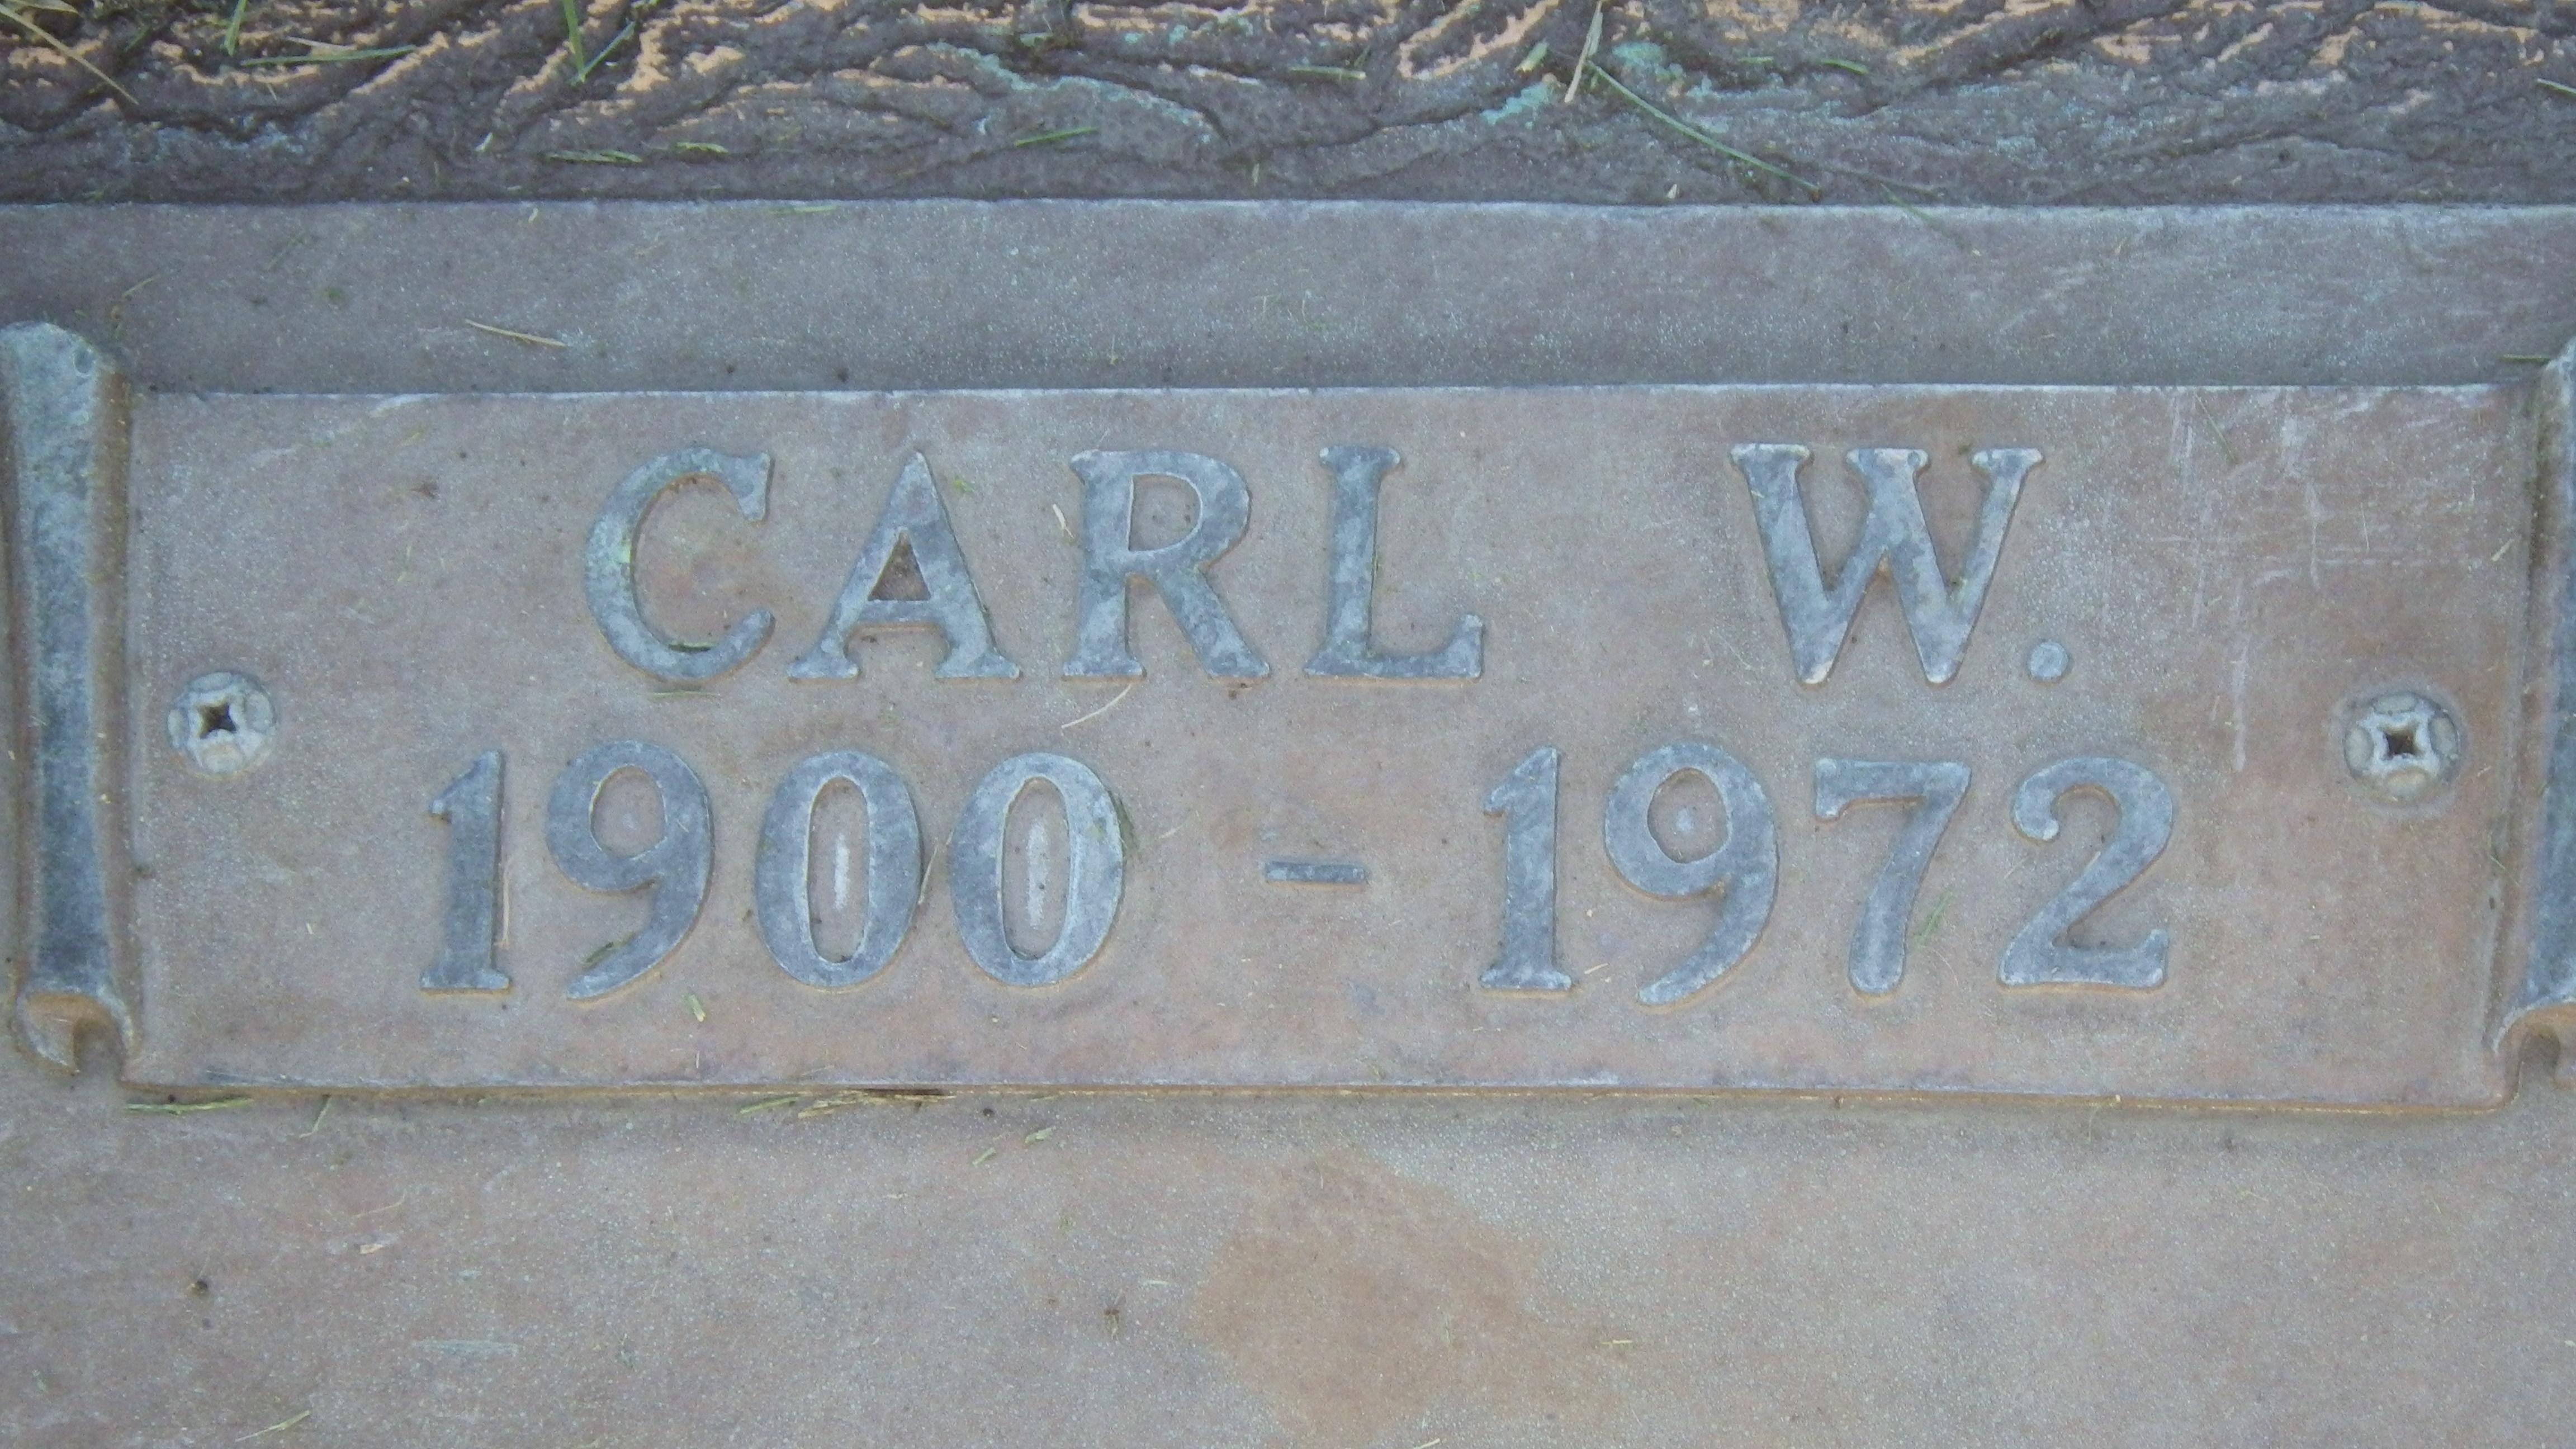 Carl W Ohlin